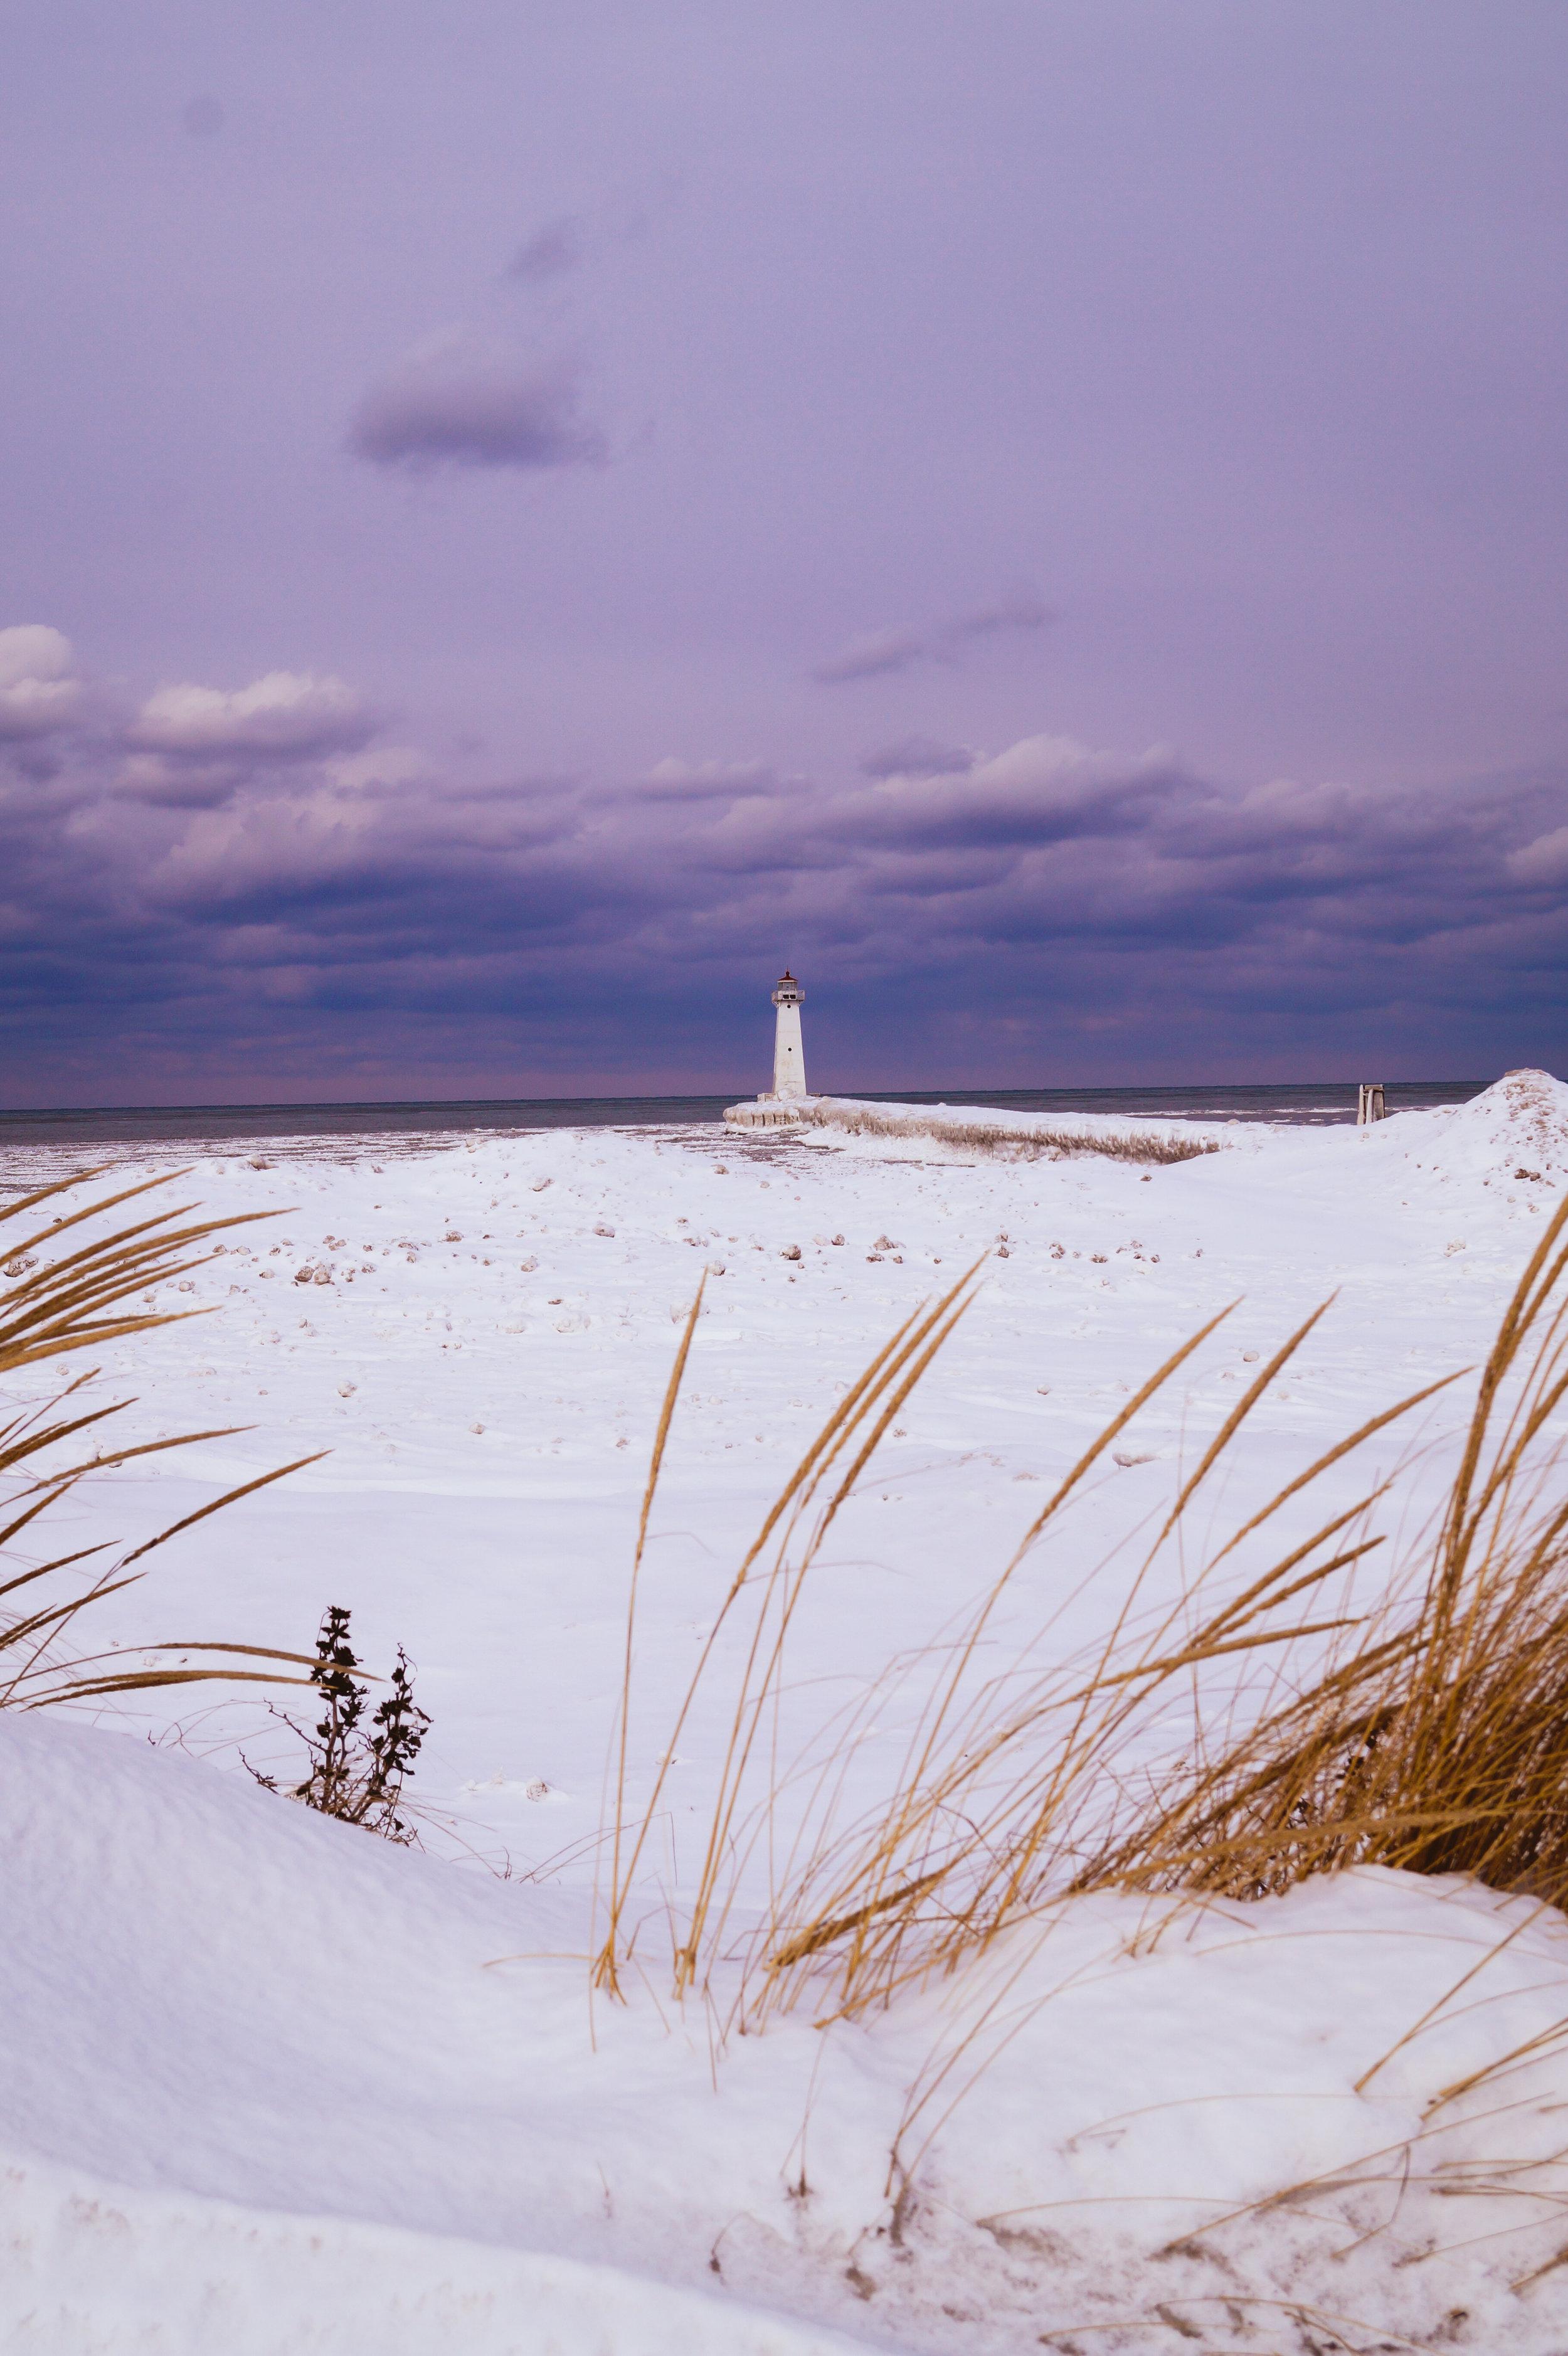 Winter at Sodus Point